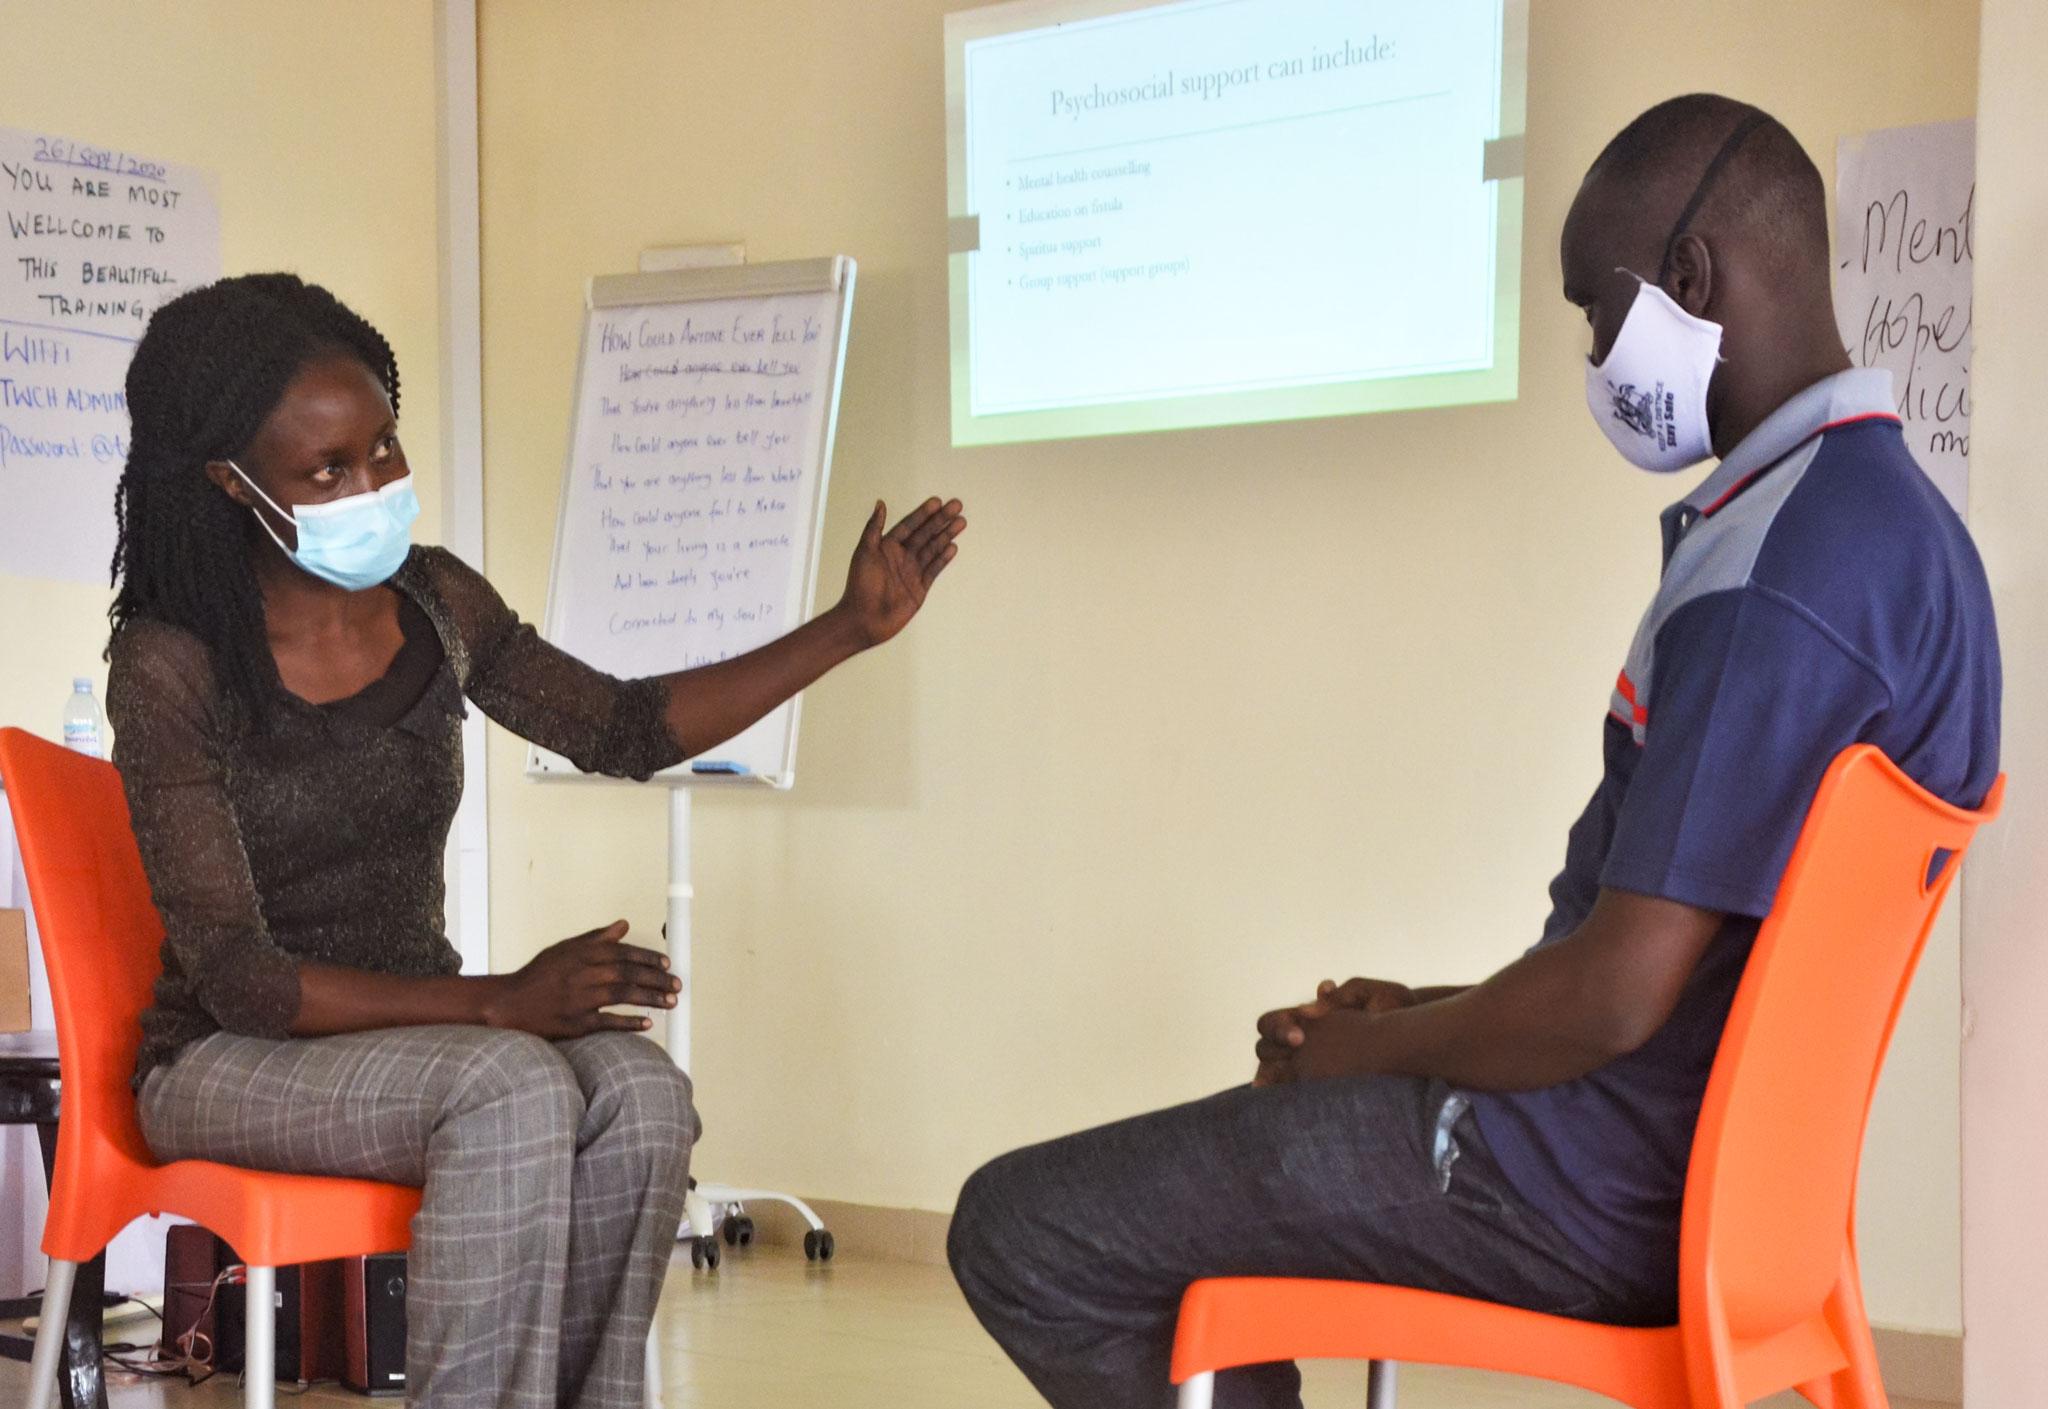 psychologe für Terrewode Uganda